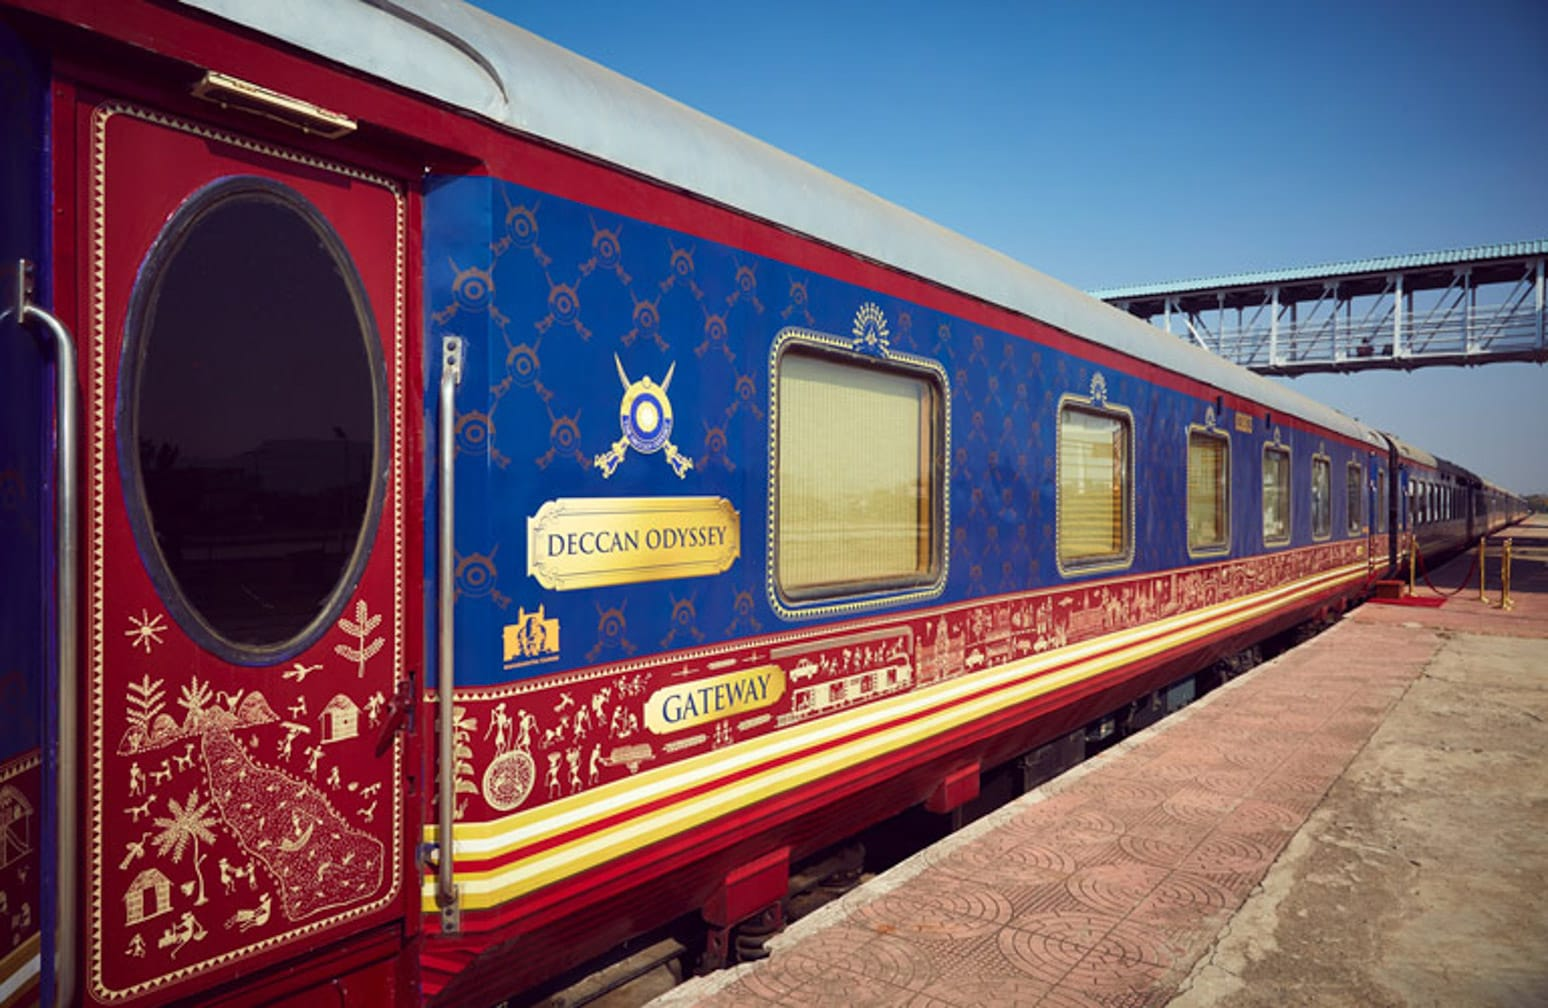 exterior of train on the Darjeeling Mail: Mumbai to Kolkata by Luxury Deccan Odyssey Train journey